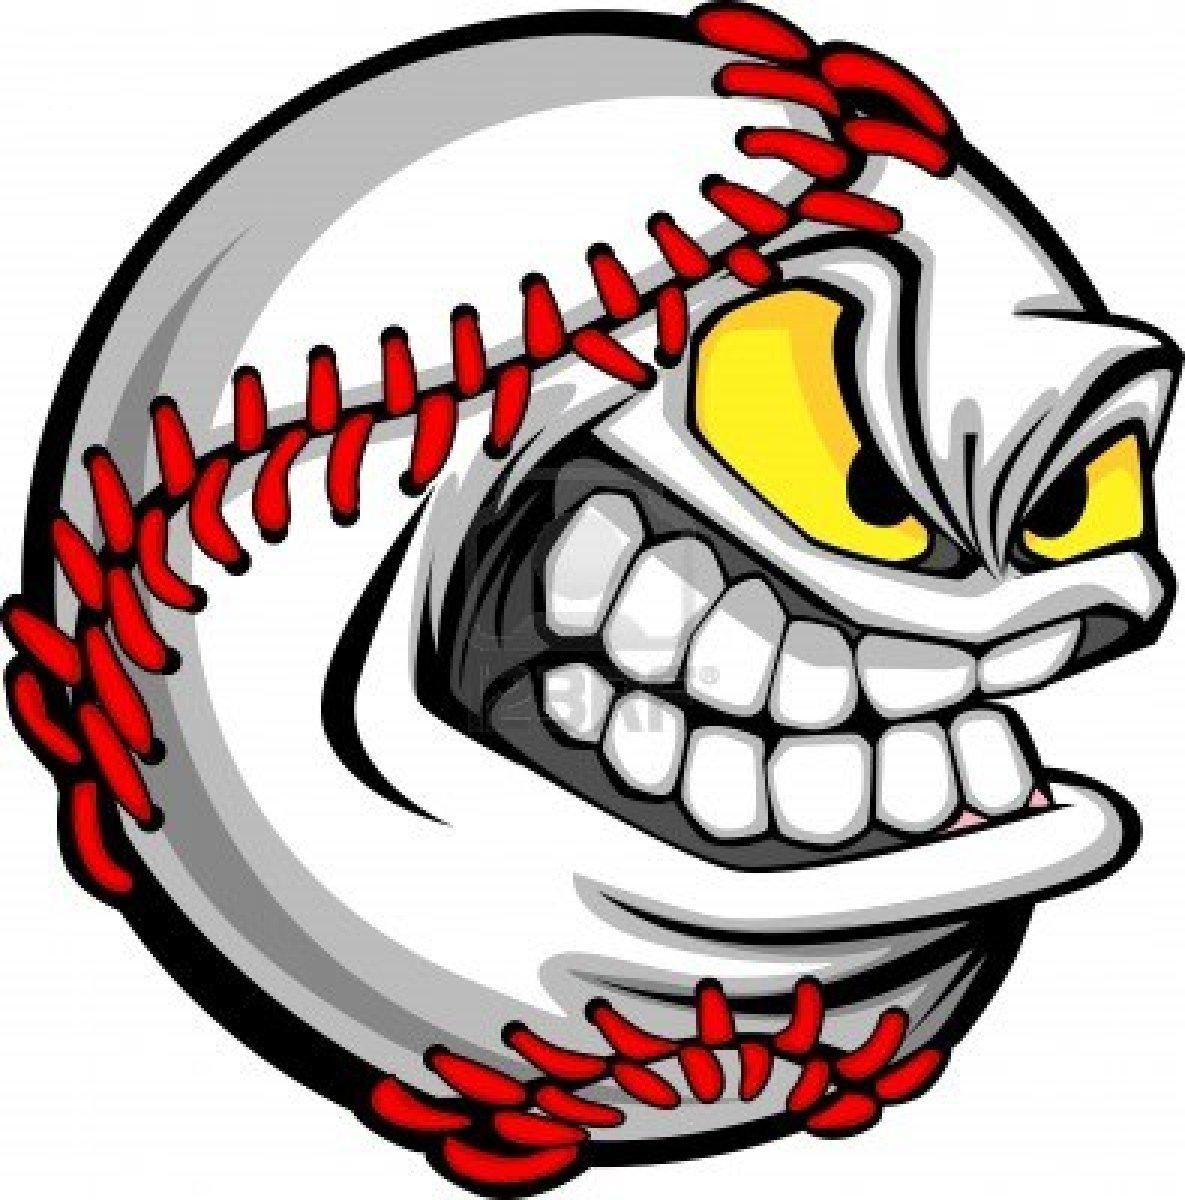 Mean baseball